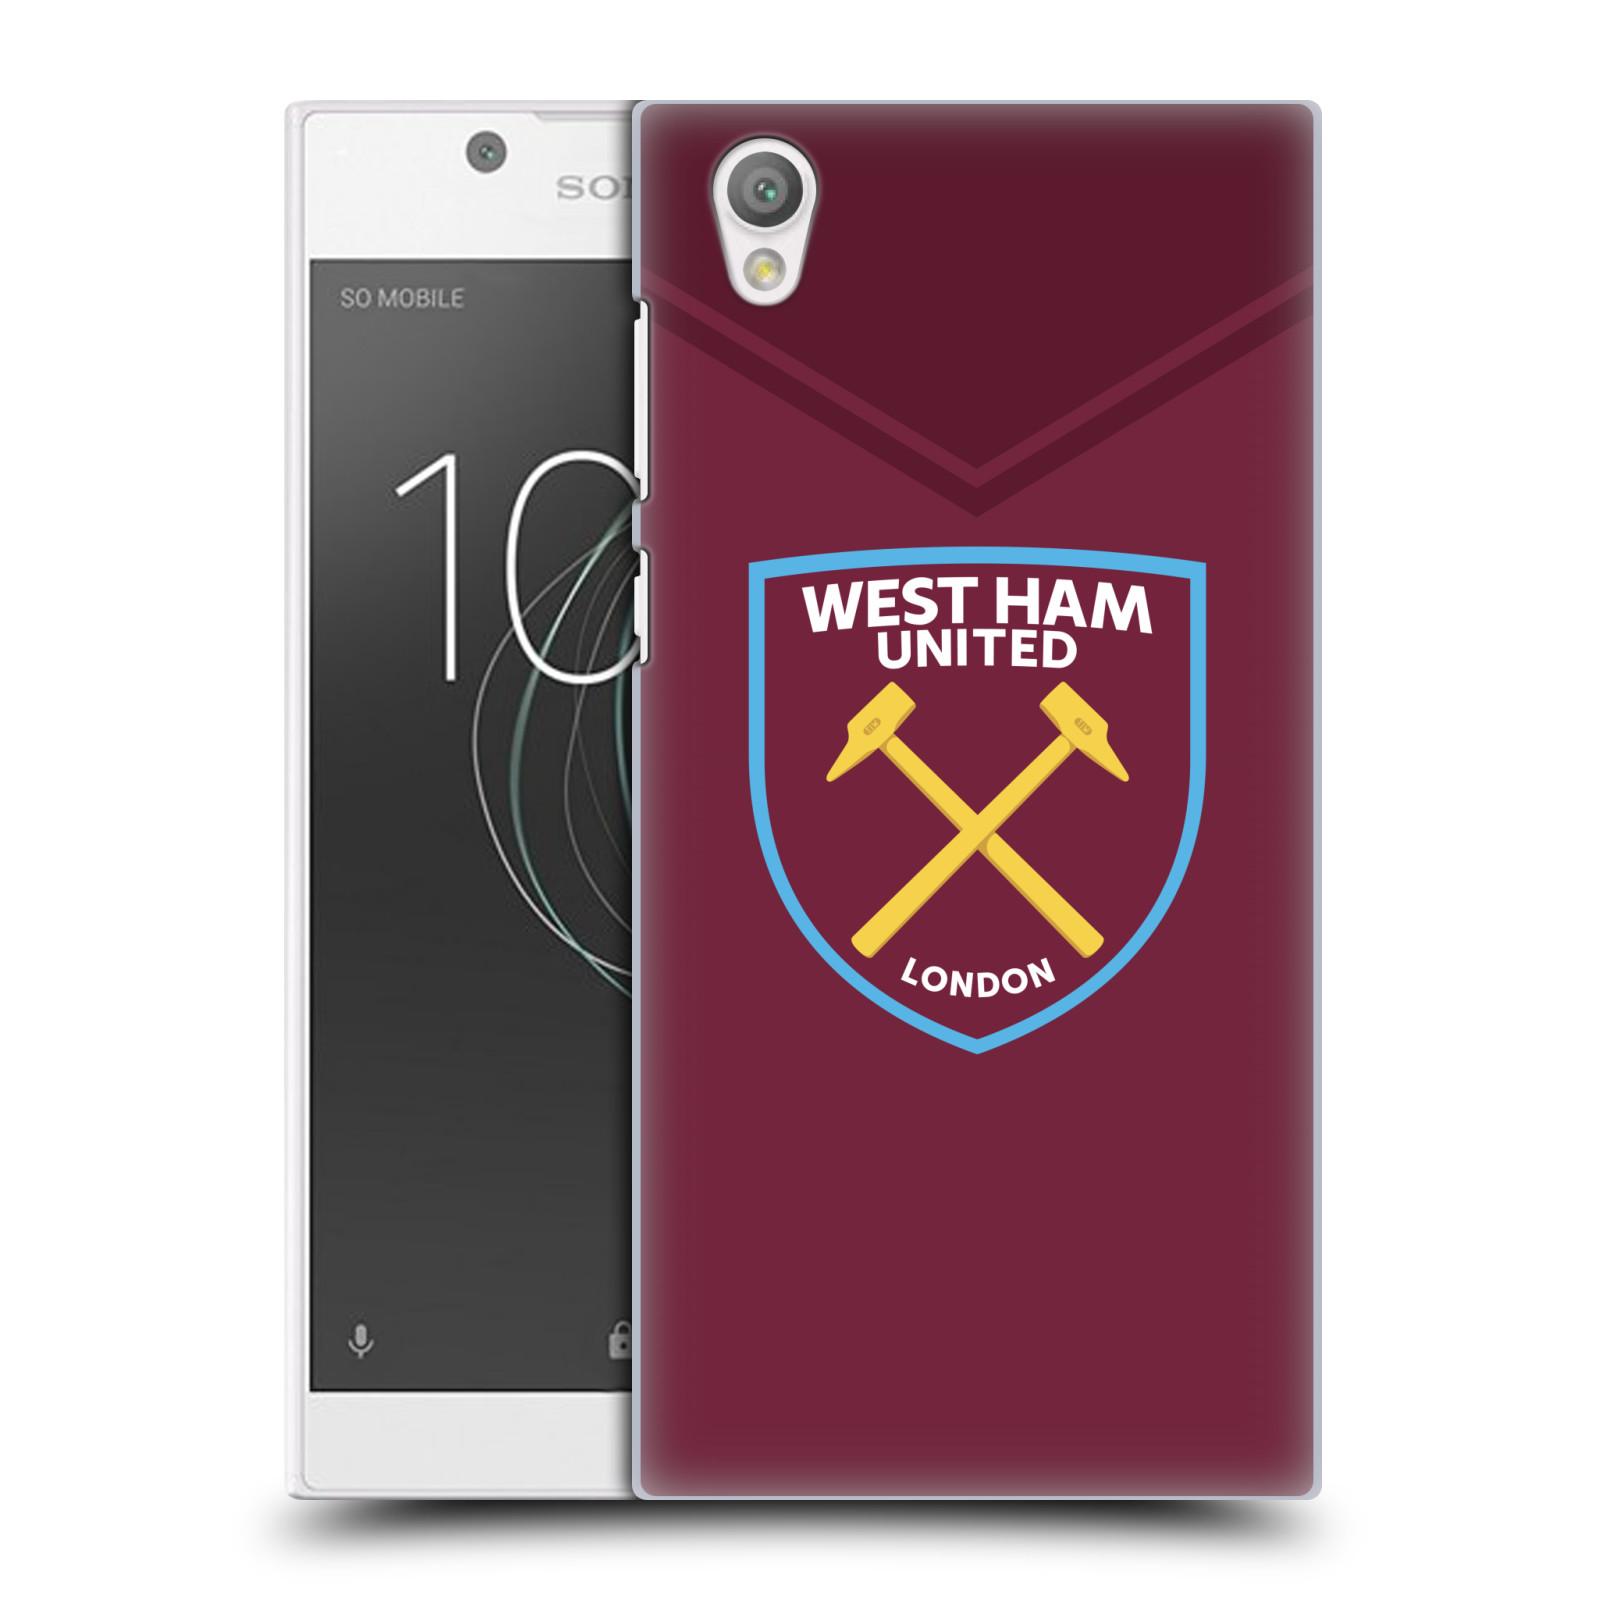 Plastové pouzdro na mobil Sony Xperia L1 - Head Case - West Ham United - Logo